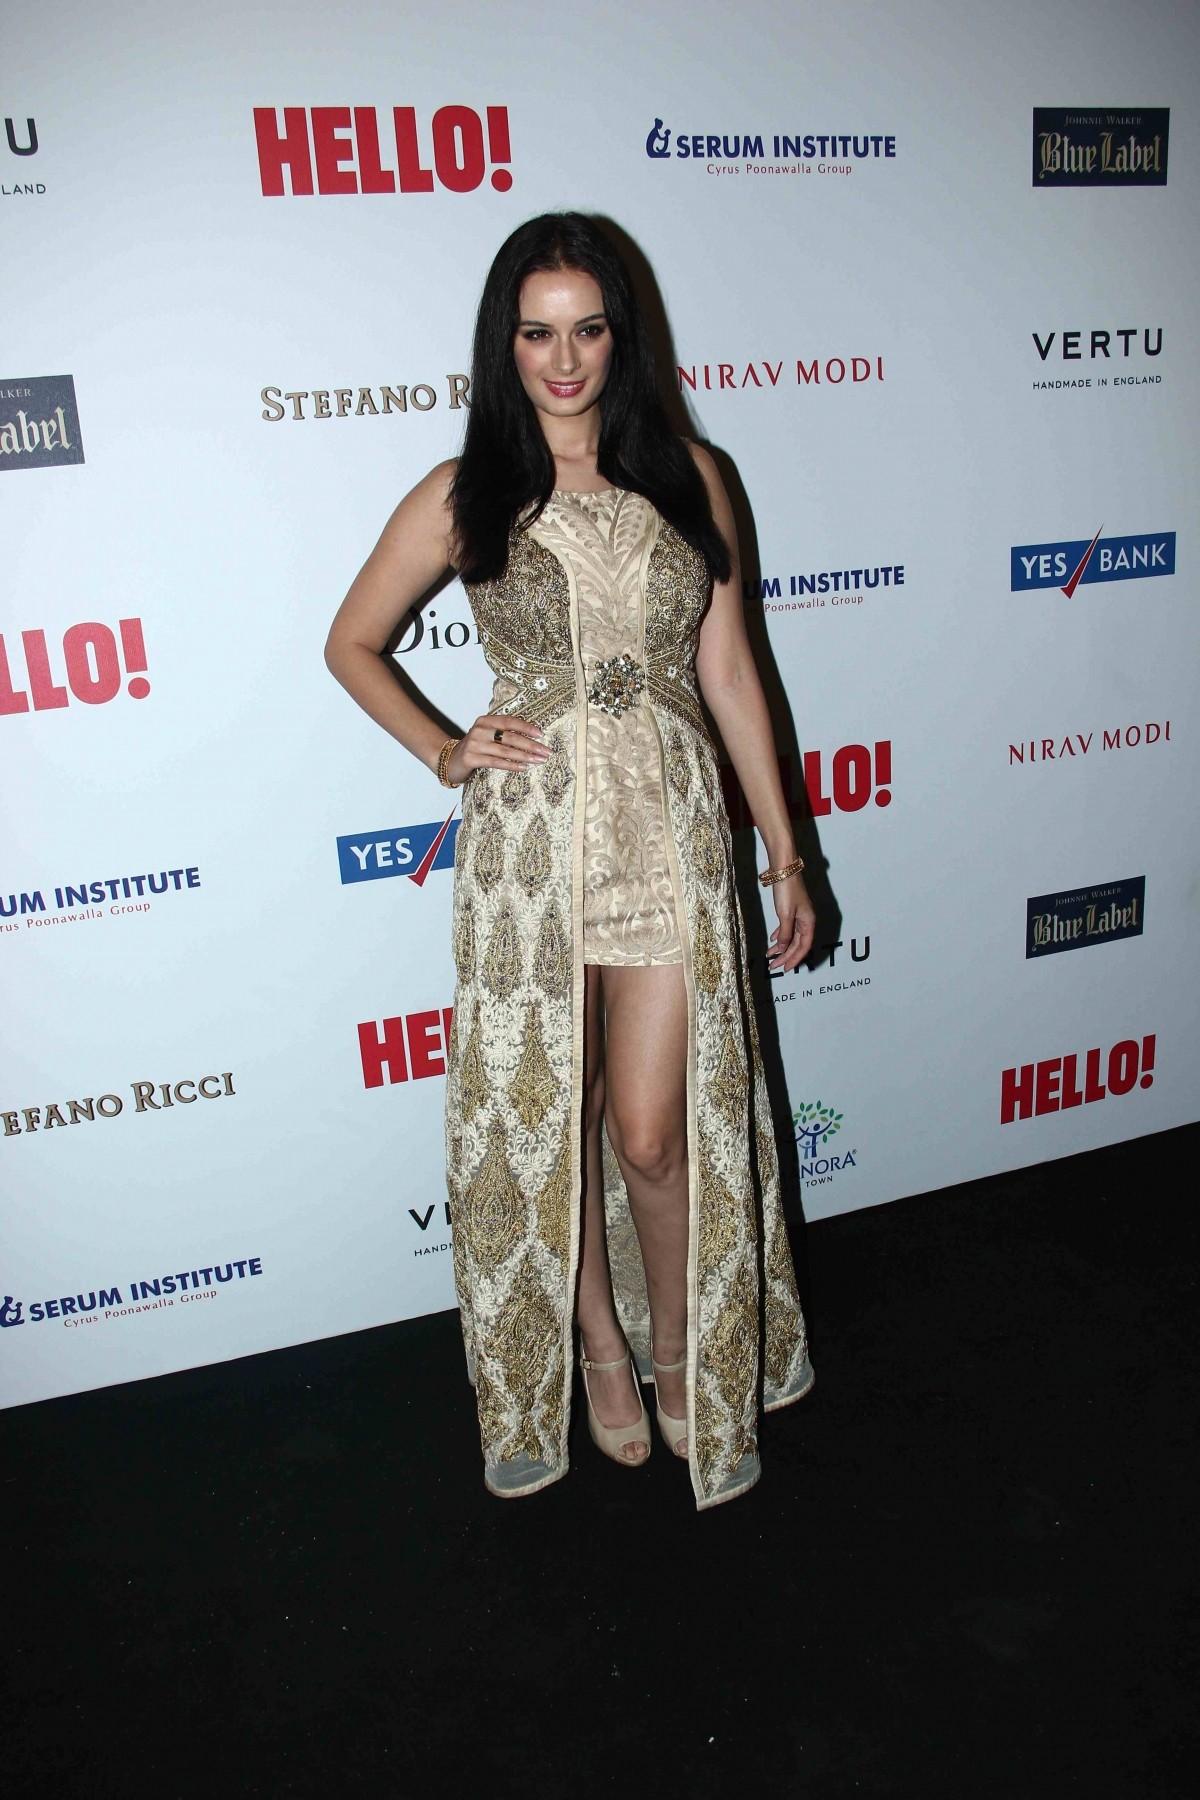 Hello! Hall of Fame Awards 2014: Worst Dressed Celebs